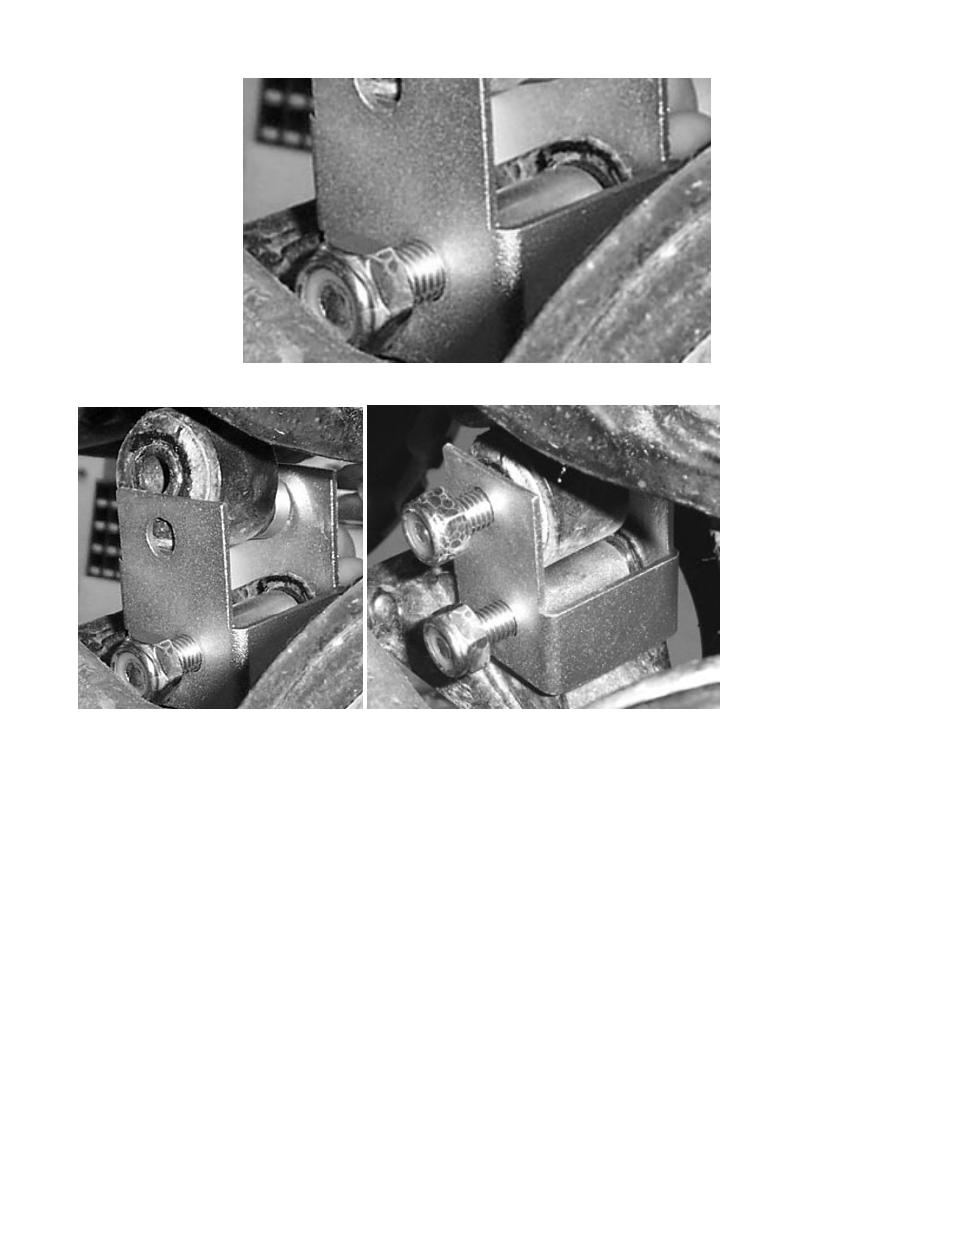 High Lifter Lift Kit for Honda Recon 250 (97-08) User Manual